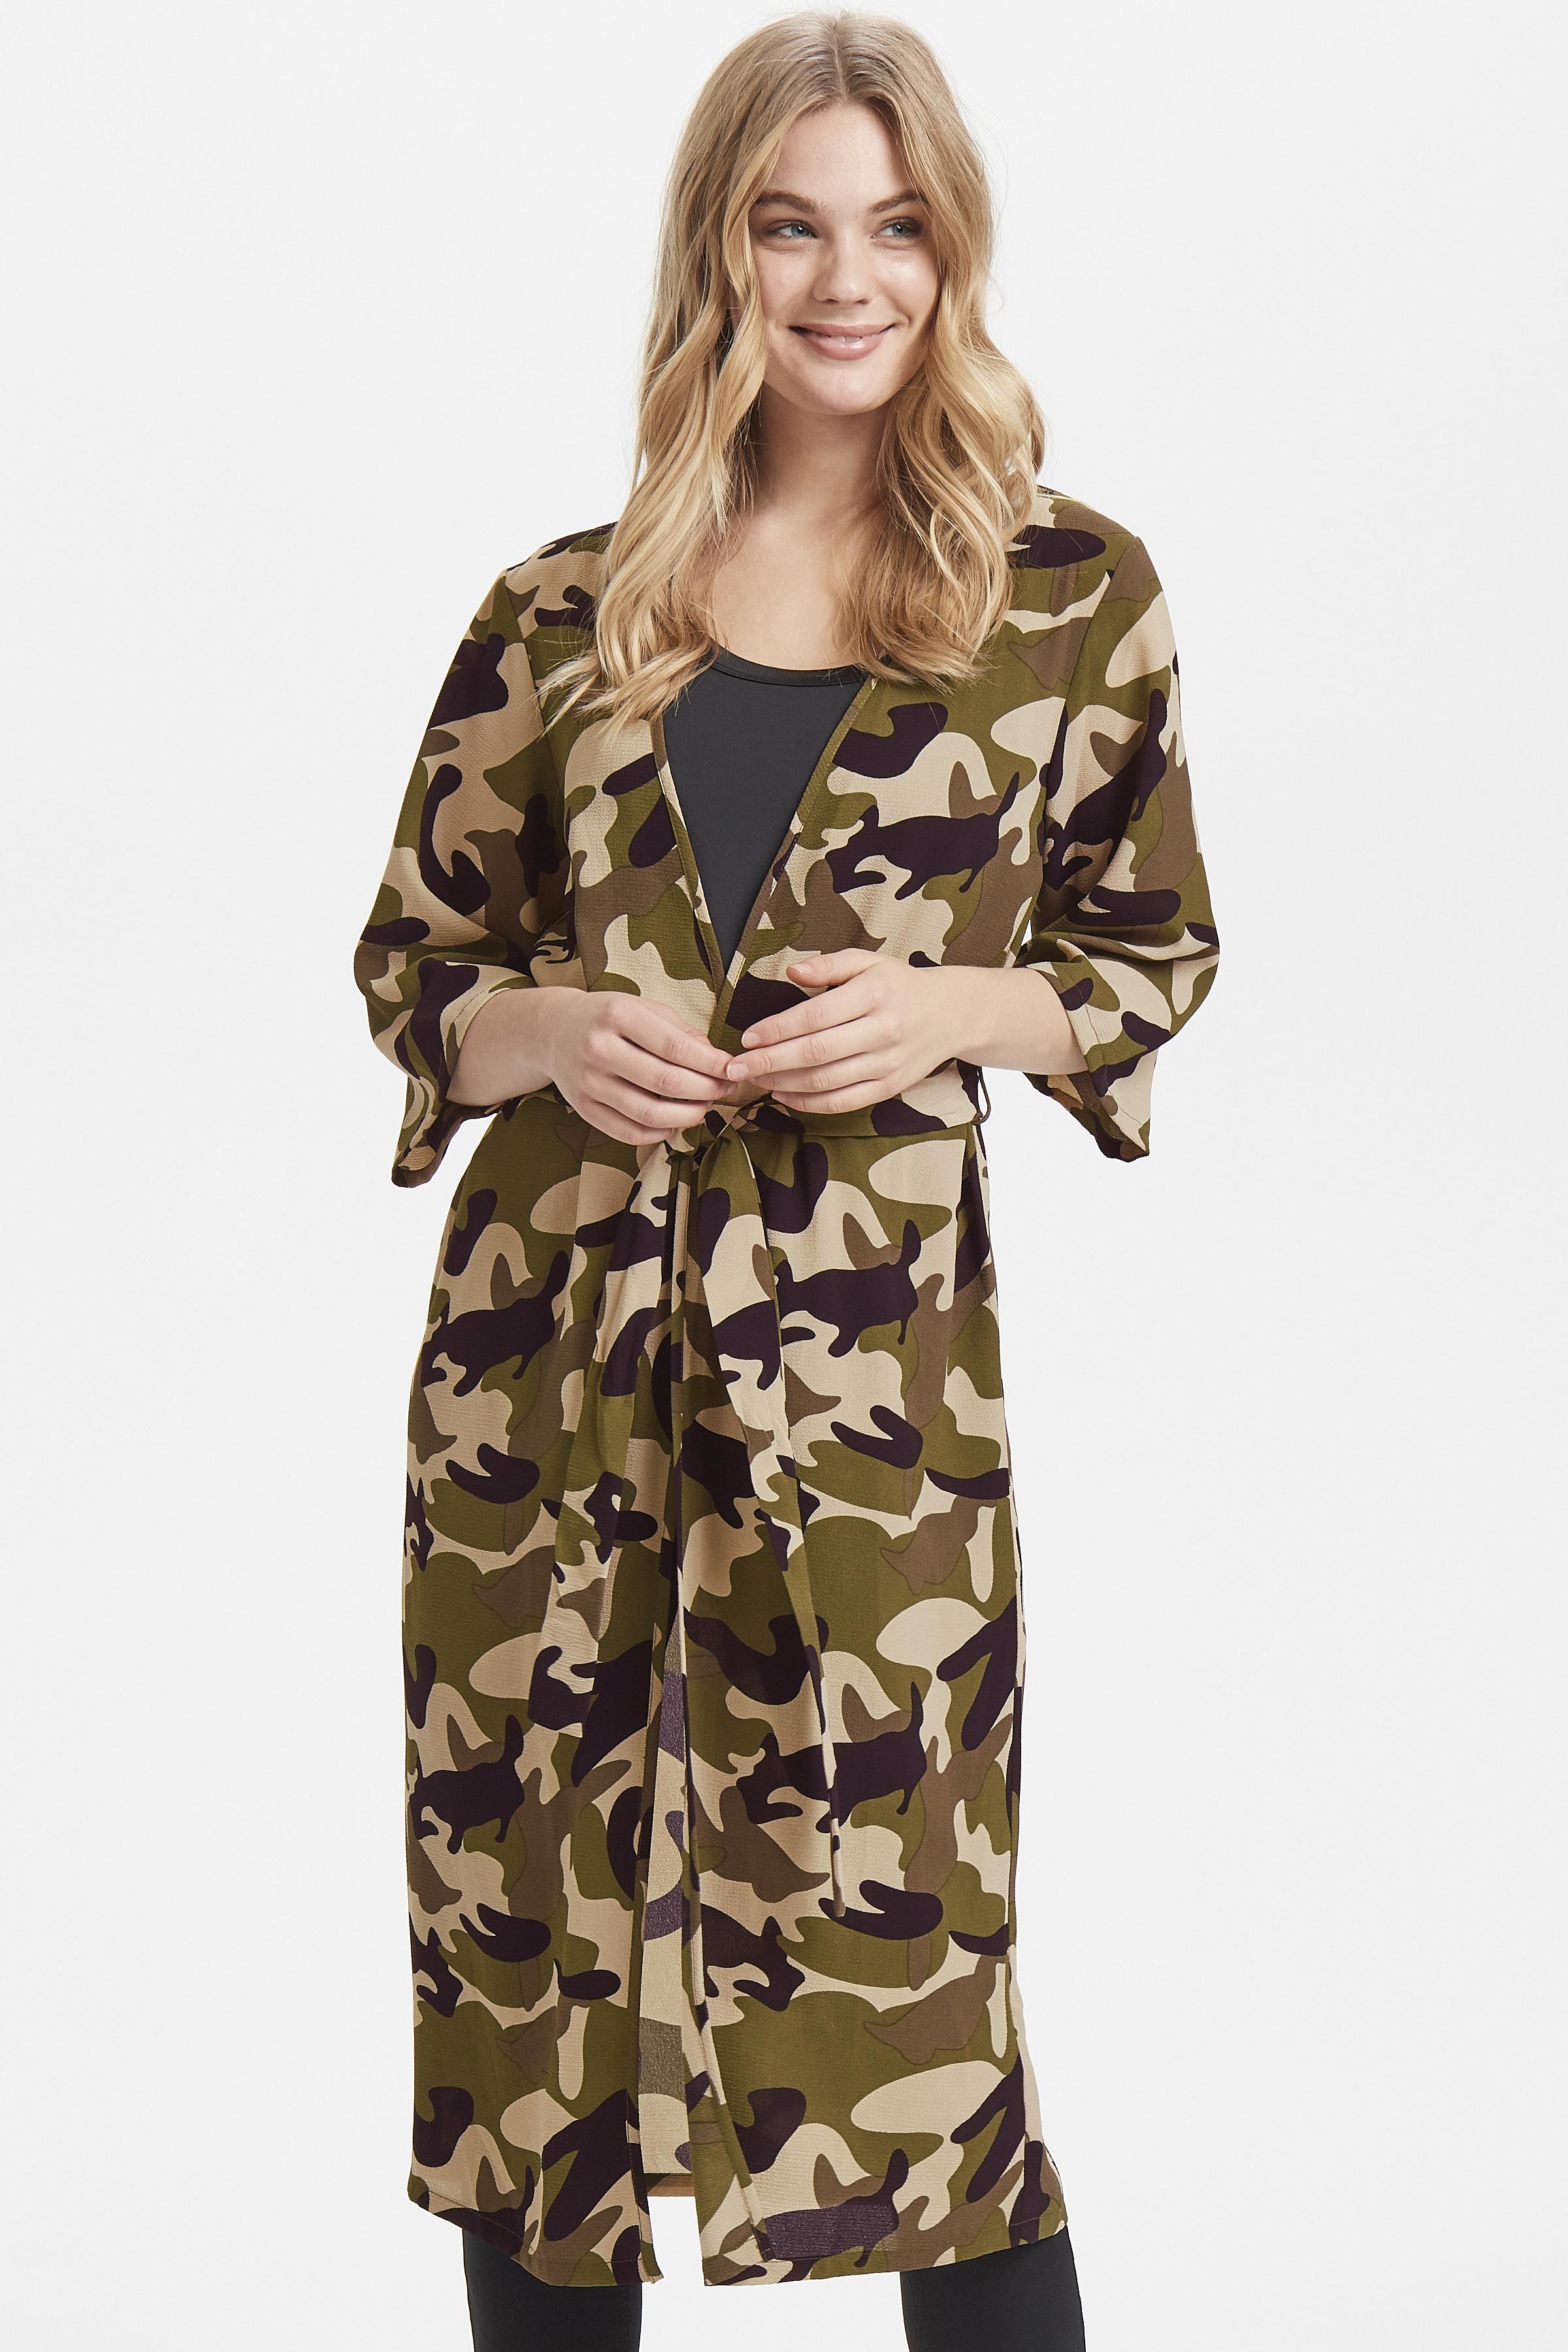 Camo combi 1 Kimono fra b.young – Køb Camo combi 1 Kimono fra str. 34-42 her